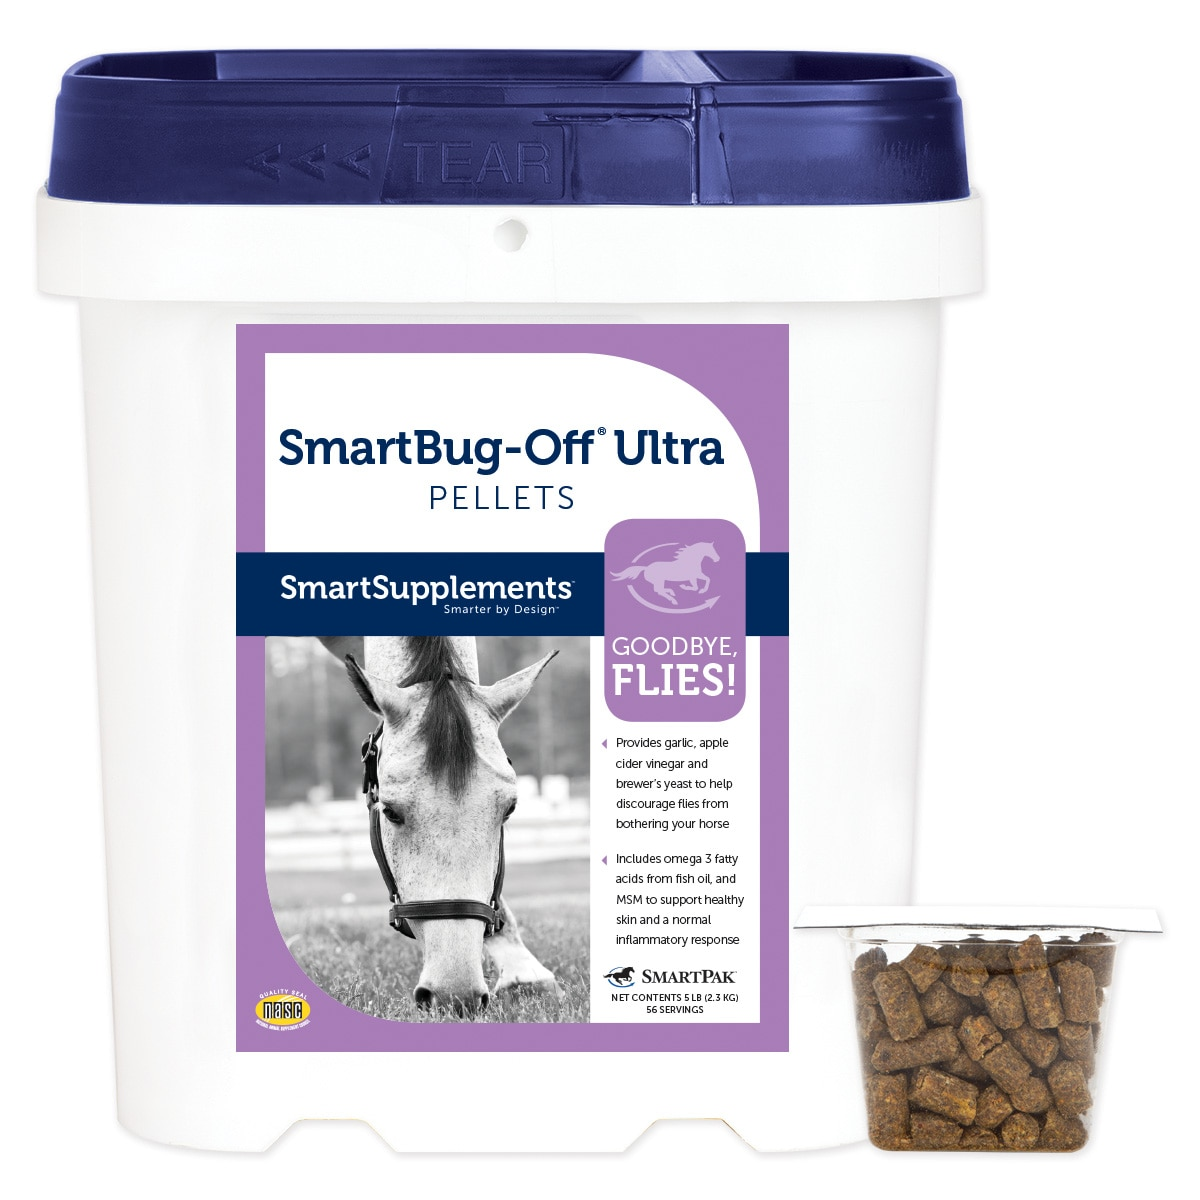 SmartBug-Off® Ultra Pellets